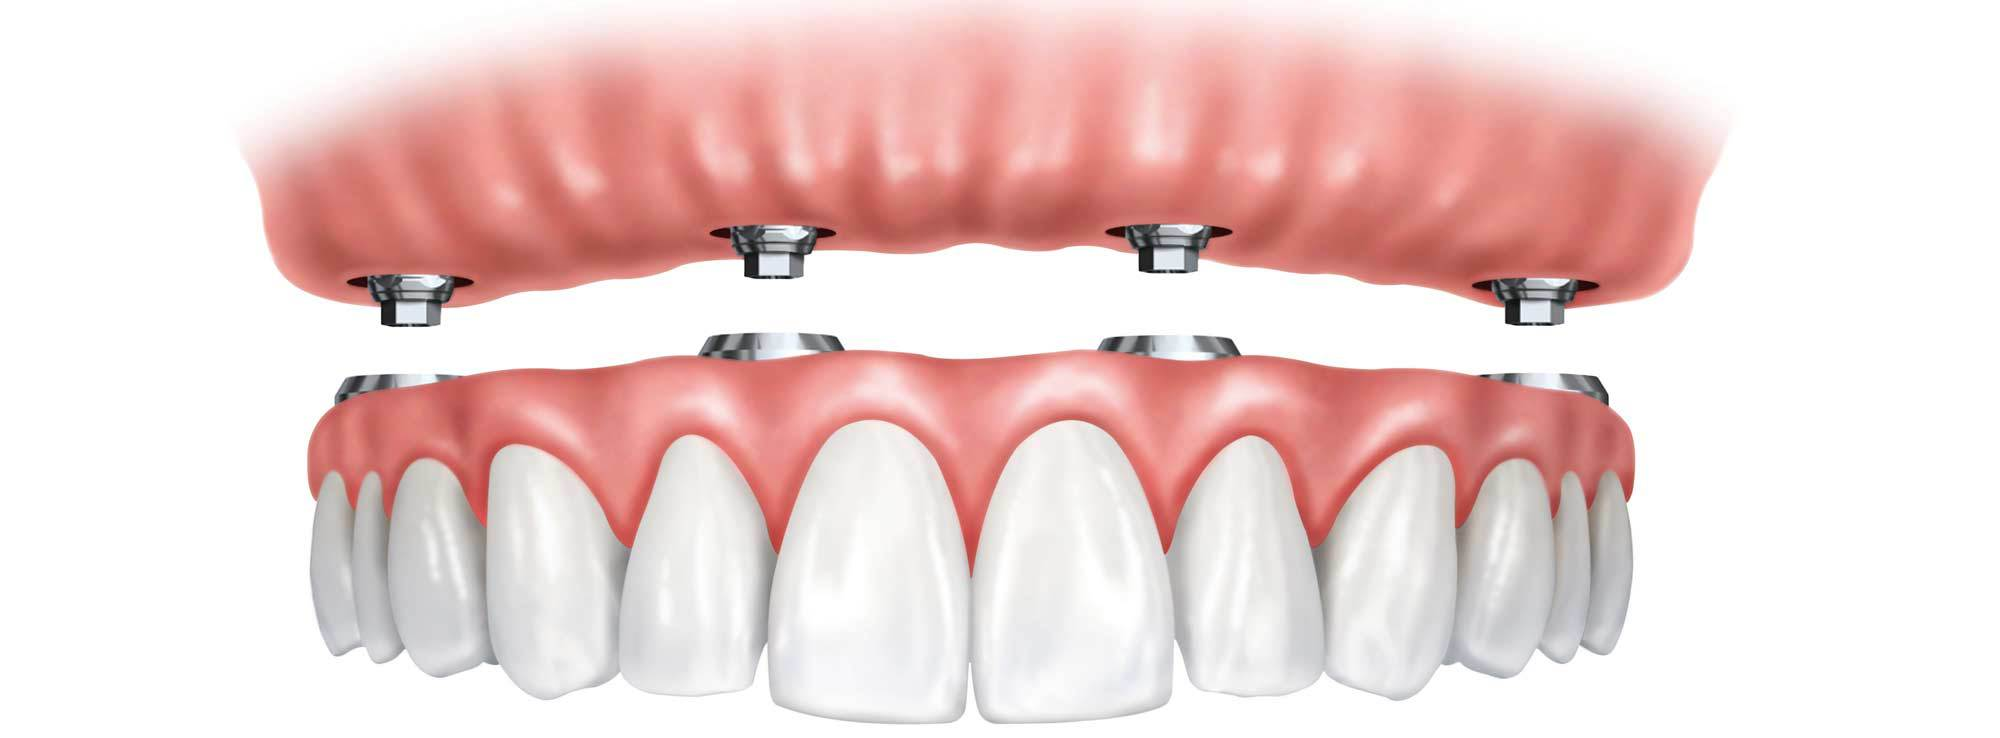 Implant Overdentures by Nassau County Periodontist Dr. Marichia Attalla